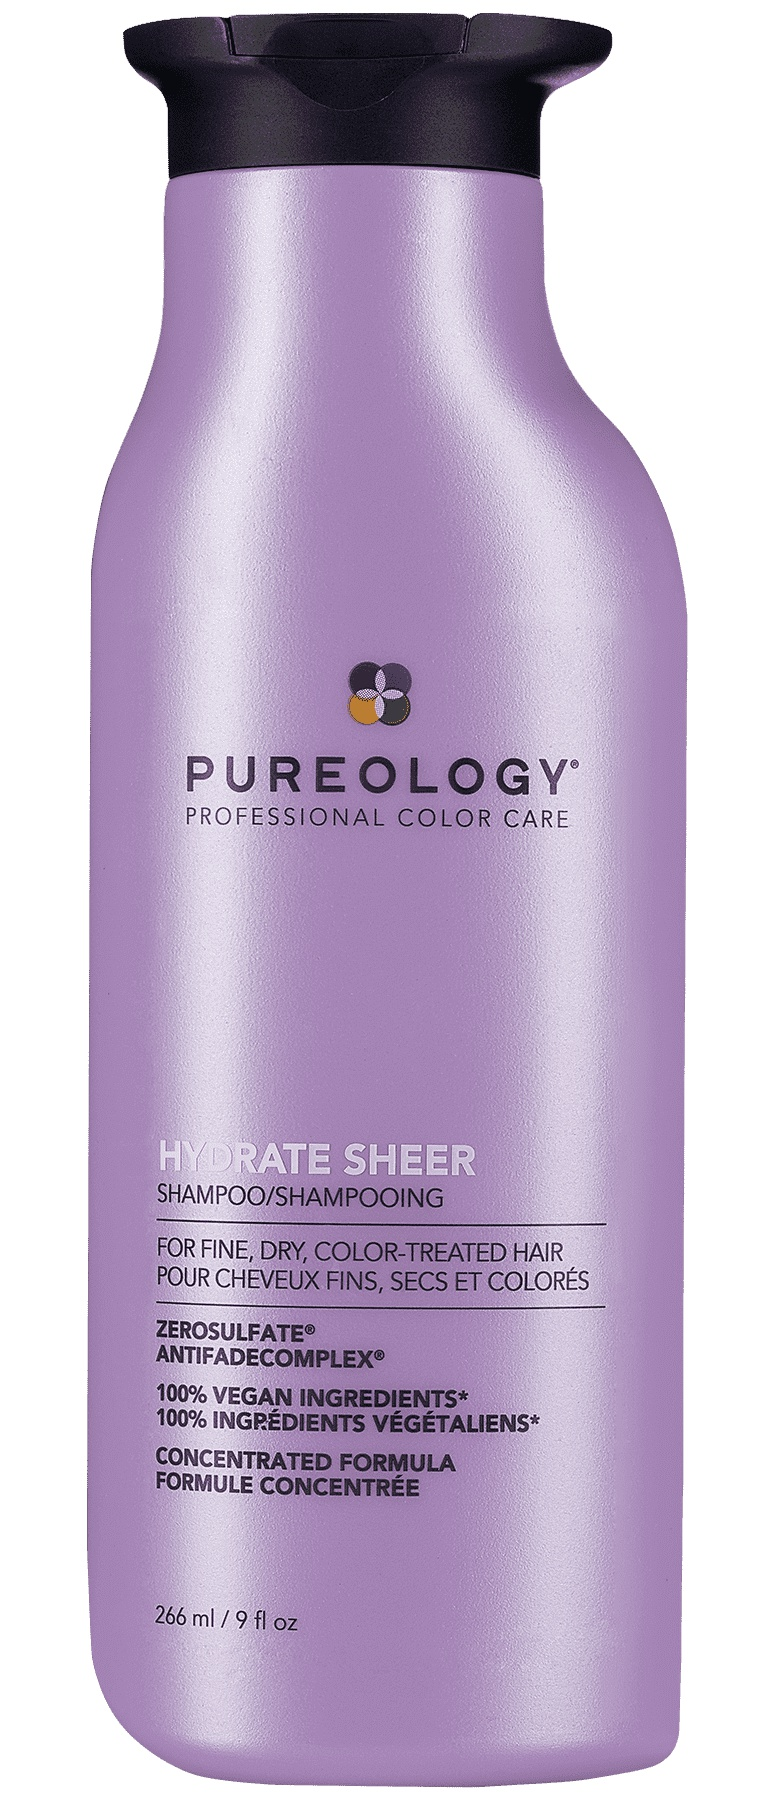 Pureology Hydrate Sheer